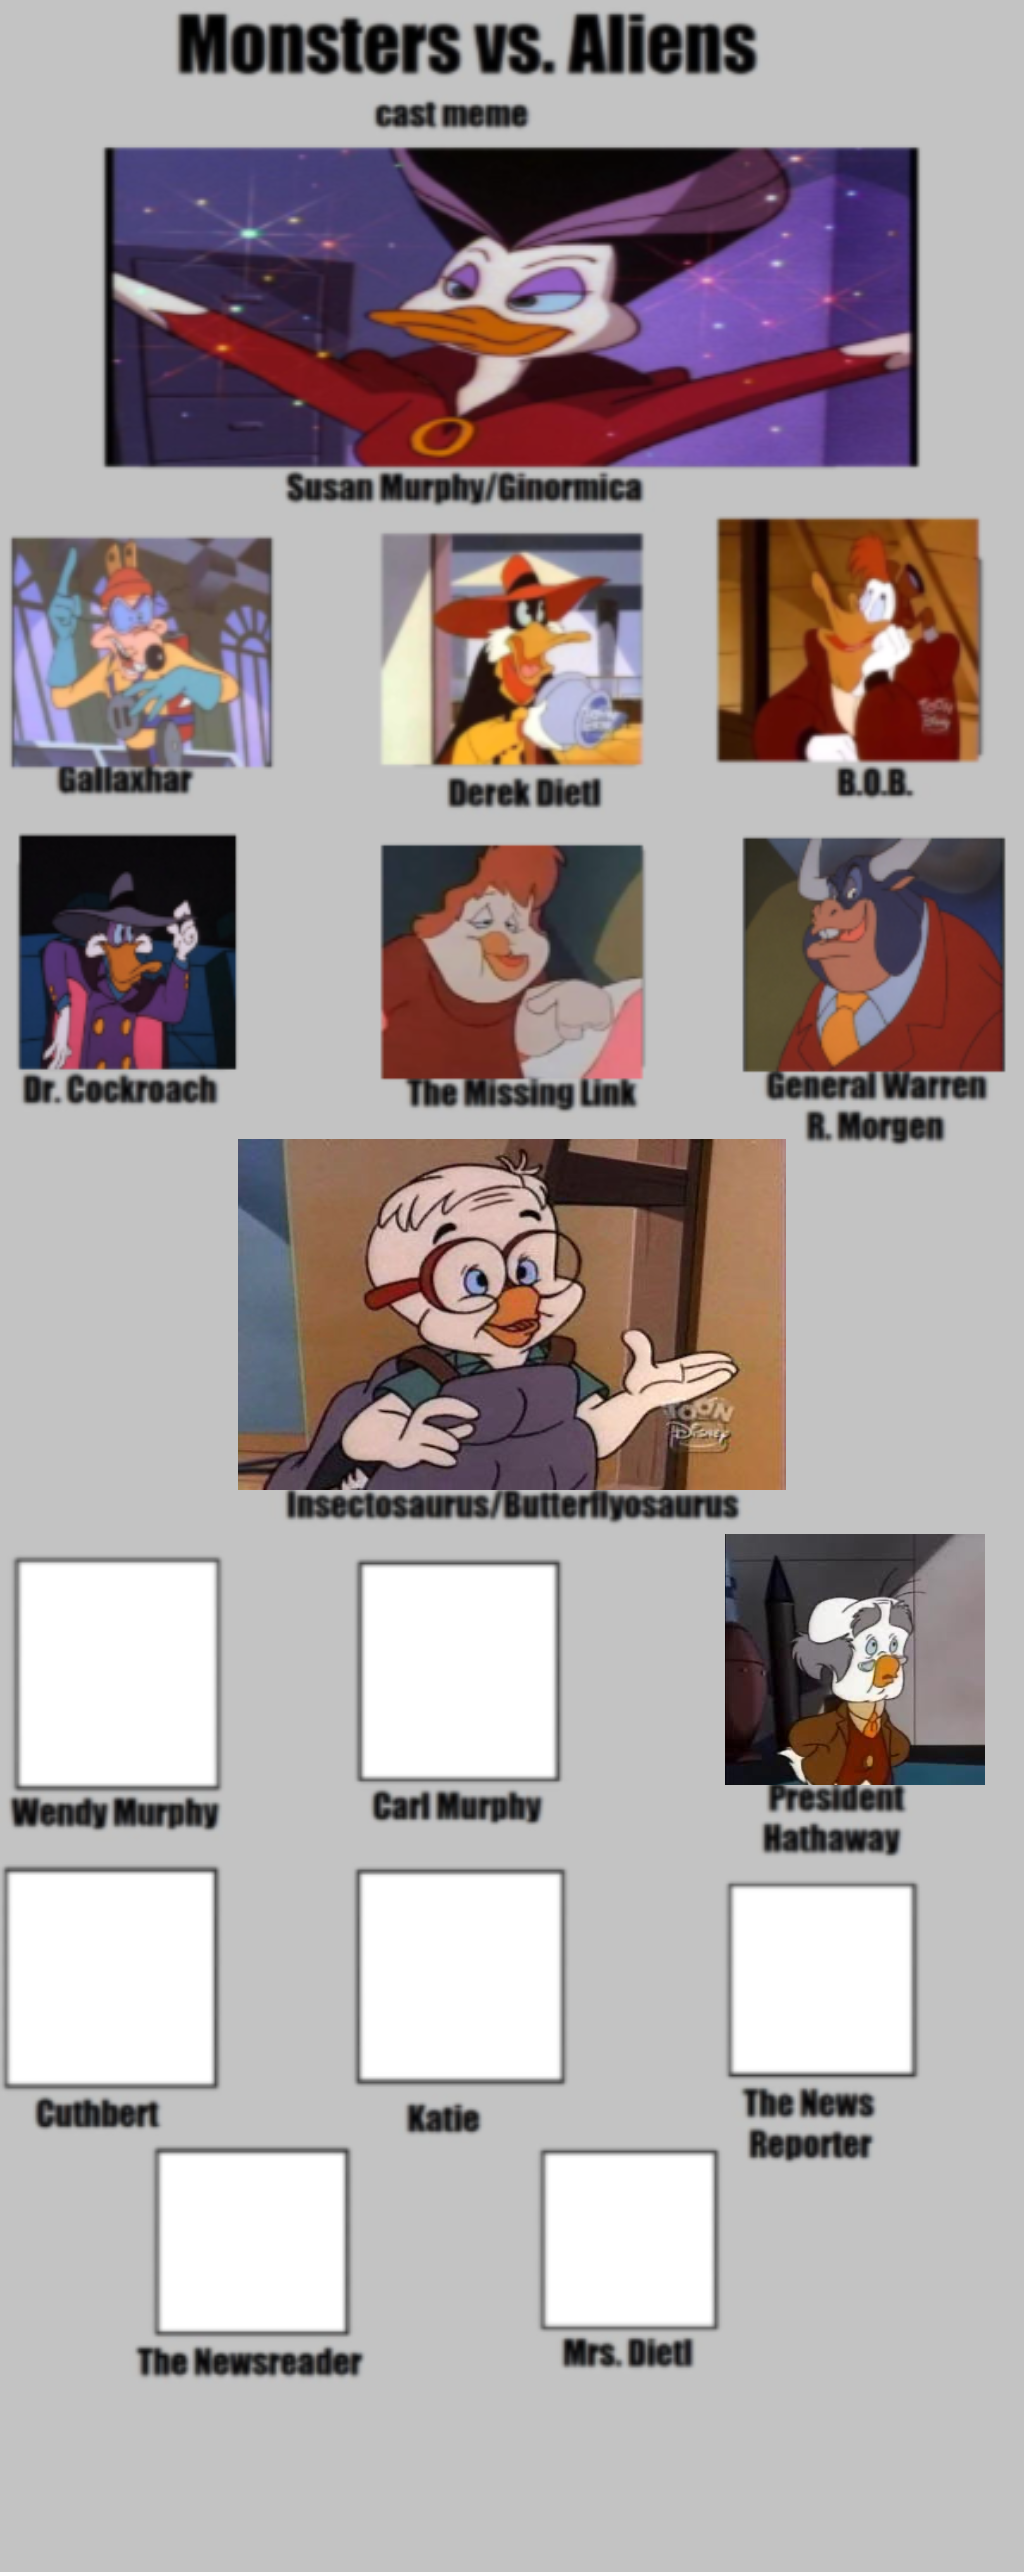 Monsters Vs Aliens Cast Meme Blank By Jamison1209 On Deviantart